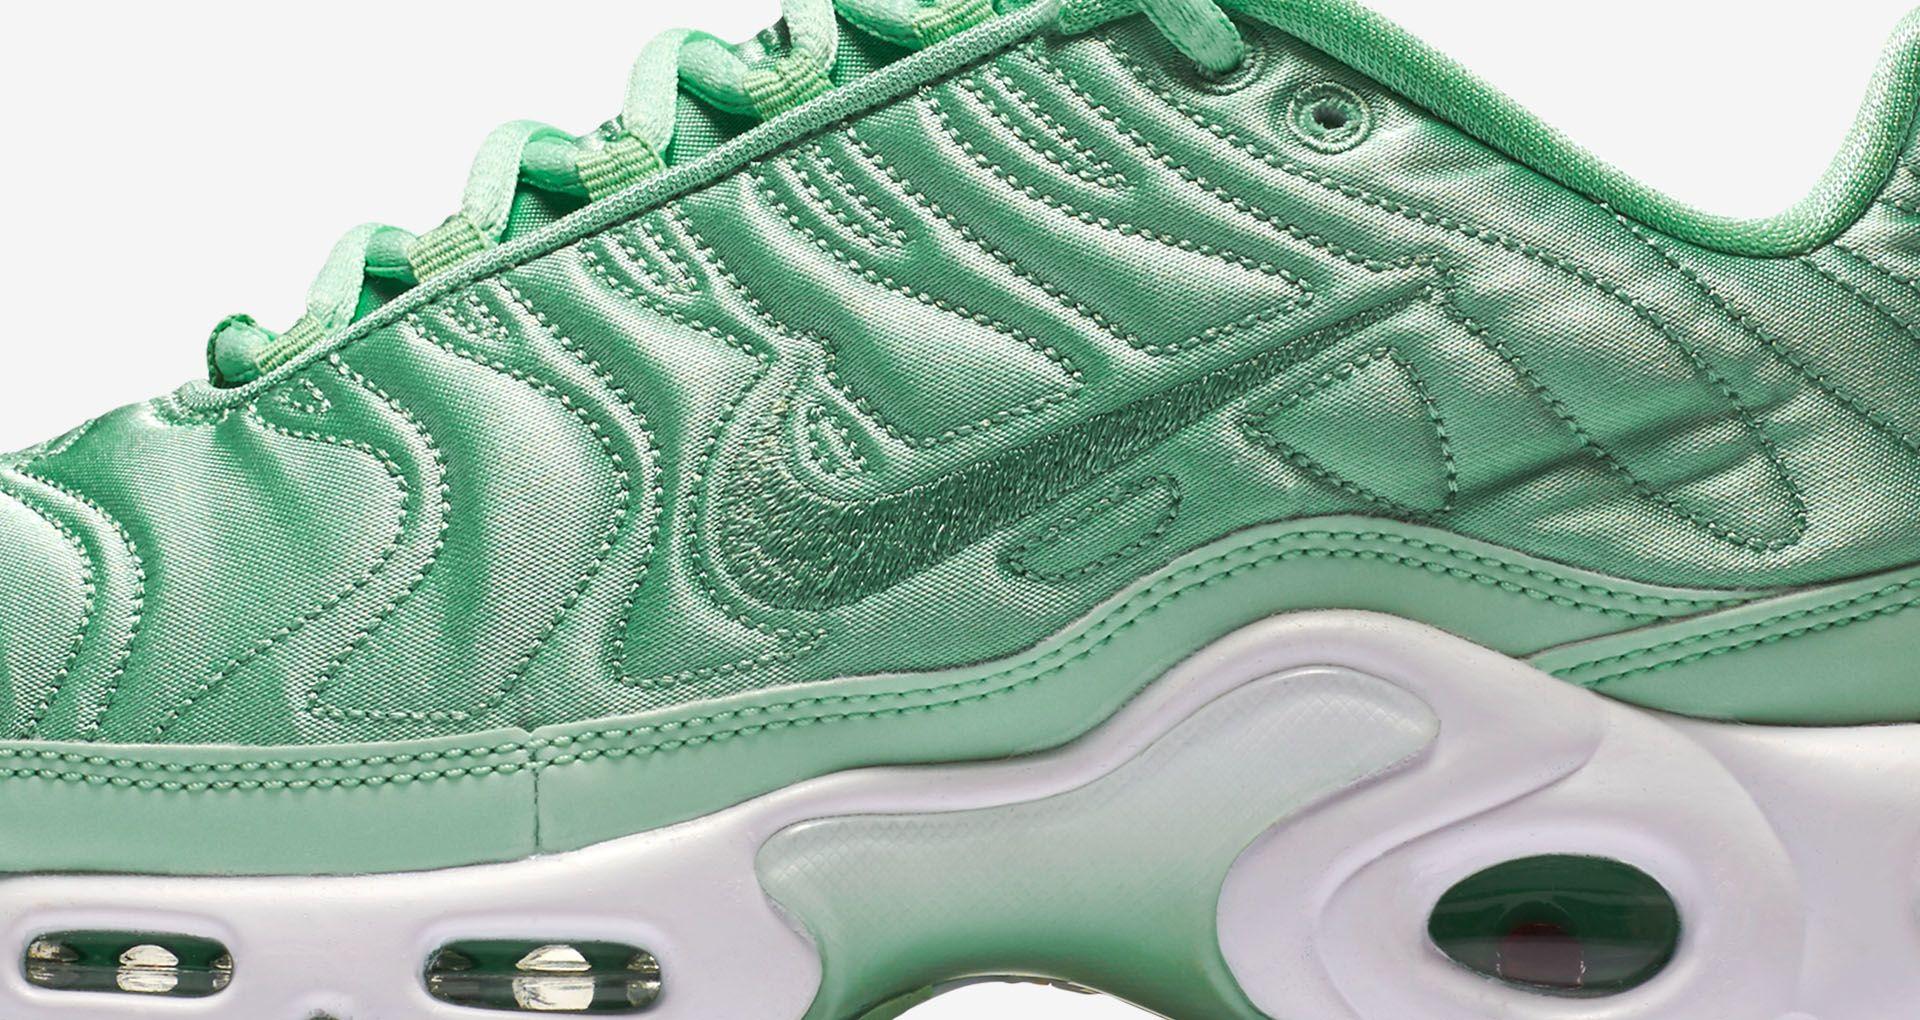 56ea27f7dc Women's Nike Air Max Plus 'Summer Satin' Mint. Nike+ SNKRS